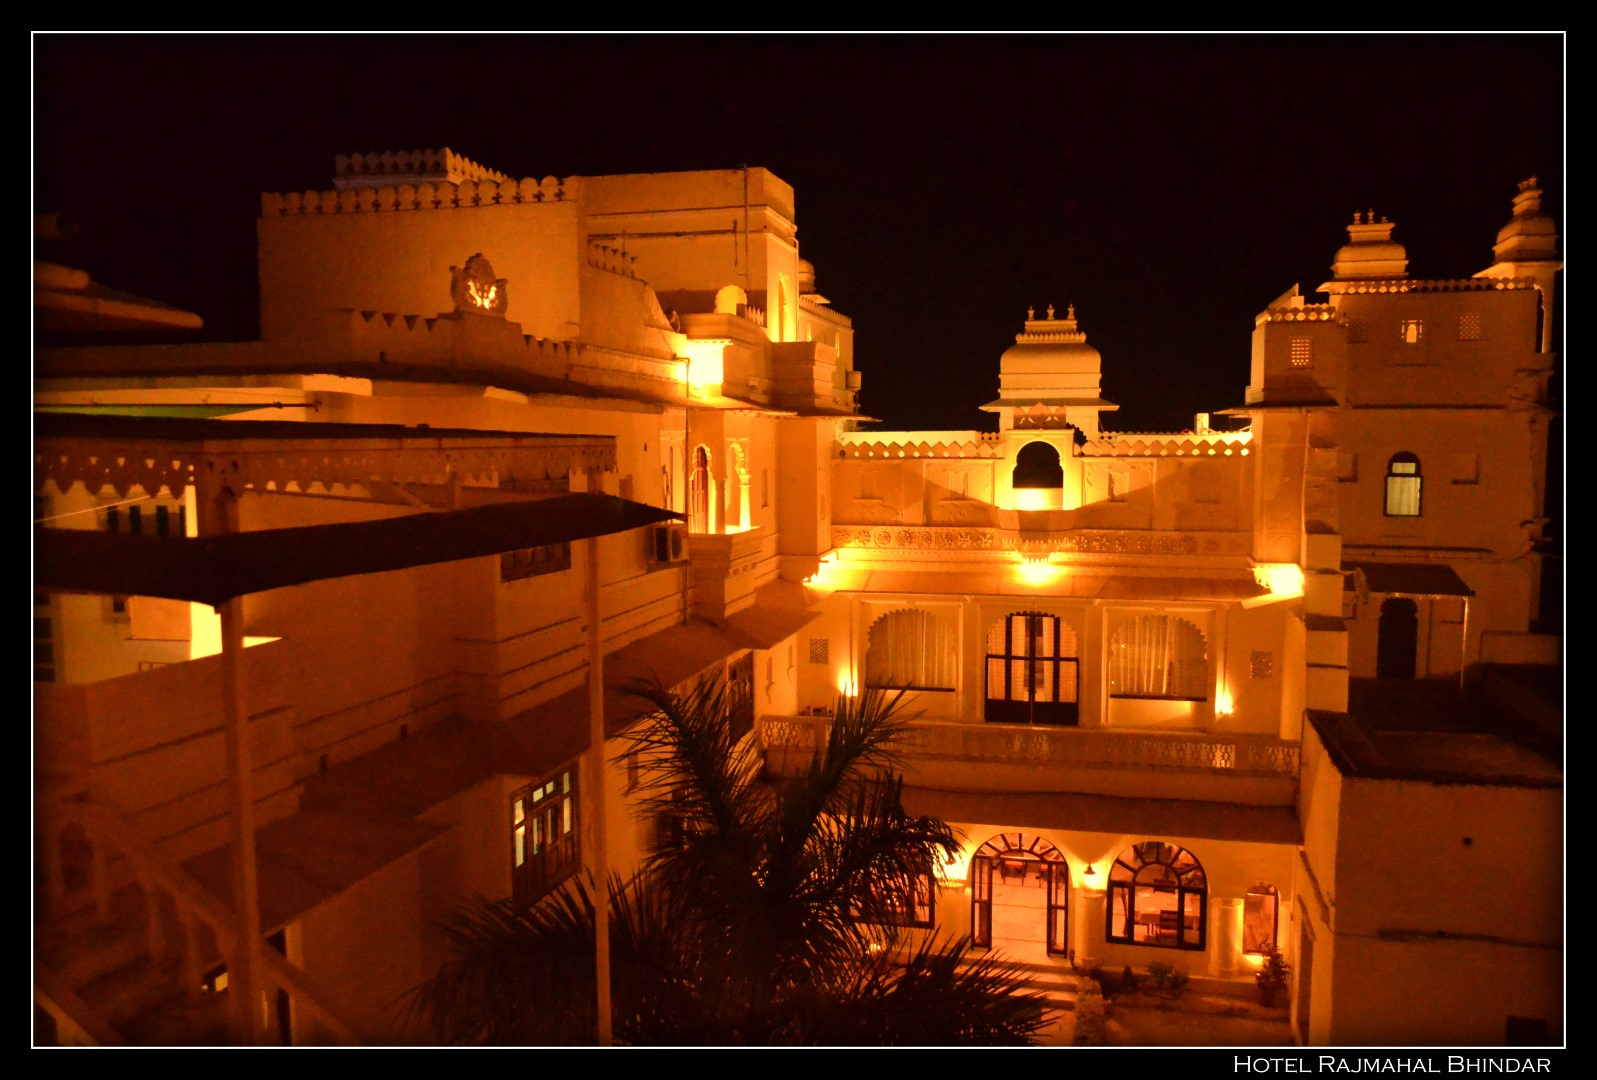 Hotel Rajmahal Bhindar welcomes 2013